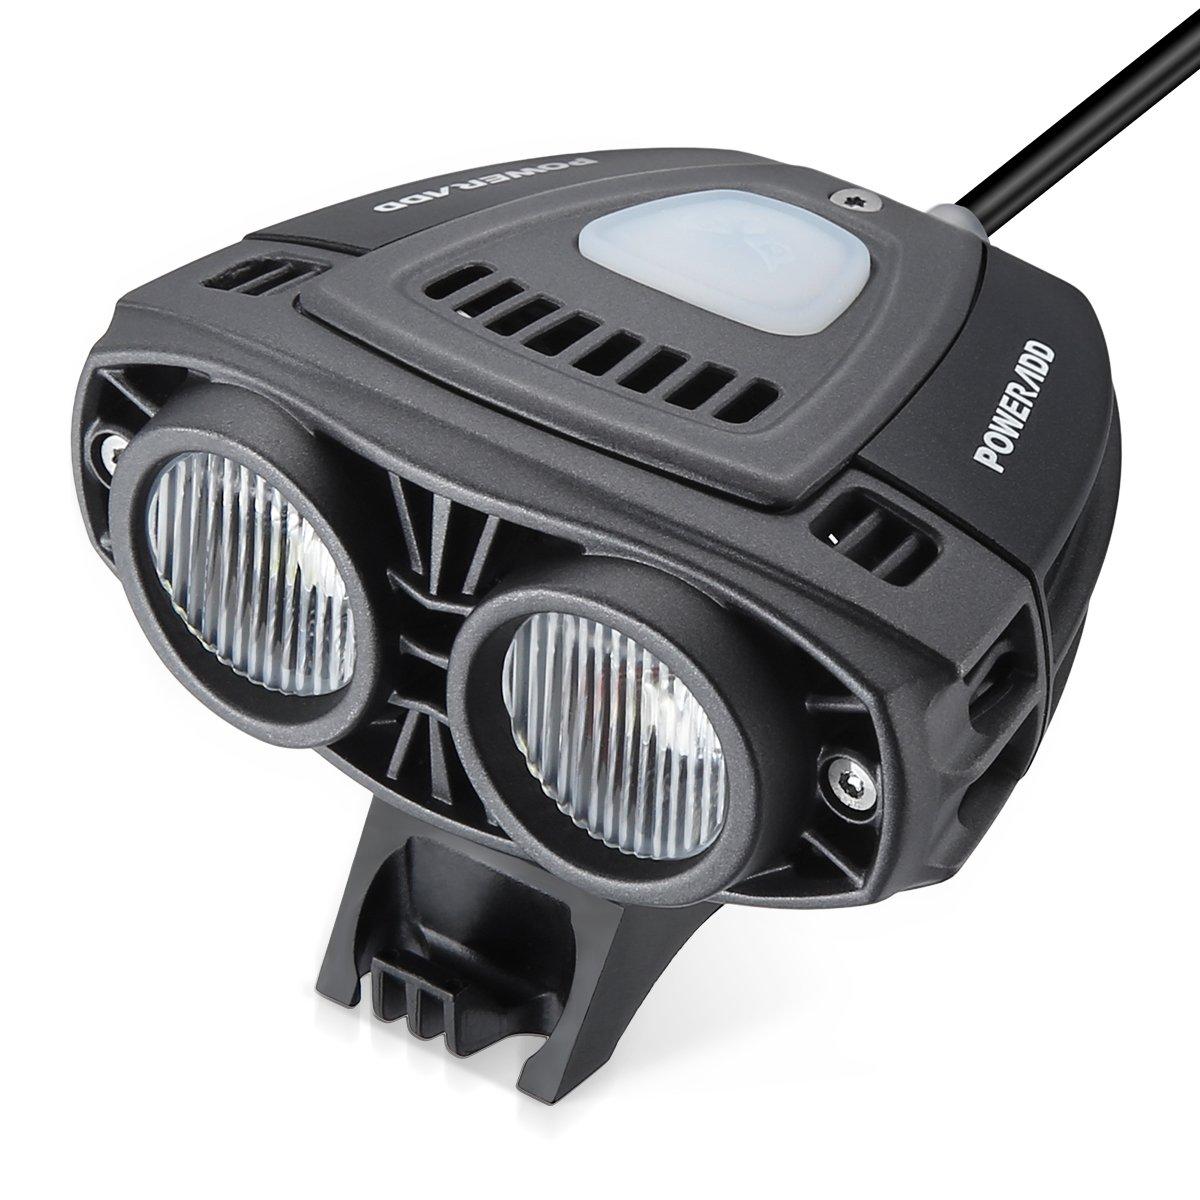 POWERADD Super Bright Headlight Front Bike Light, 12000mAh rechargeable Waterproof 1600K LED Bike Light, 3 Light modes for Bike,Road Bike,Mountain Bike,Light Bike Night Rider